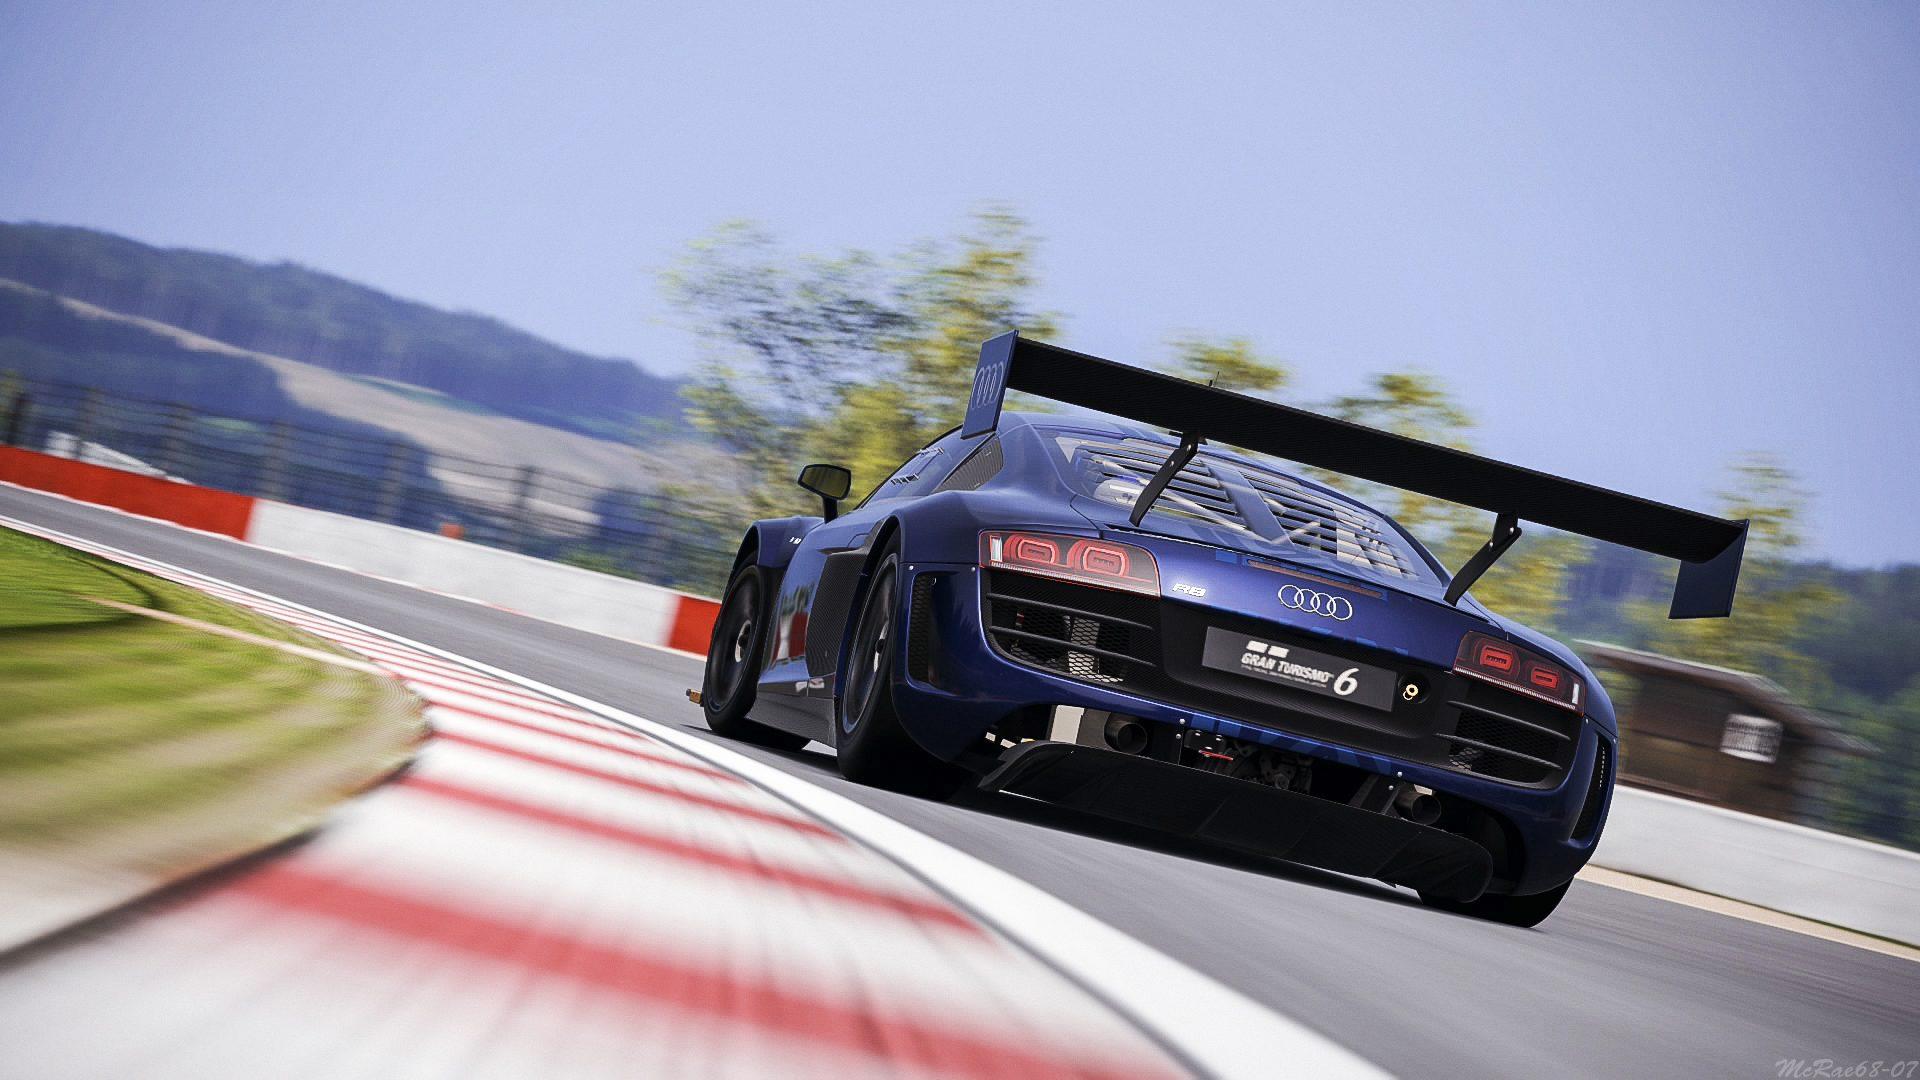 Circuit de Spa-Francorchamps gt3 2.jpg